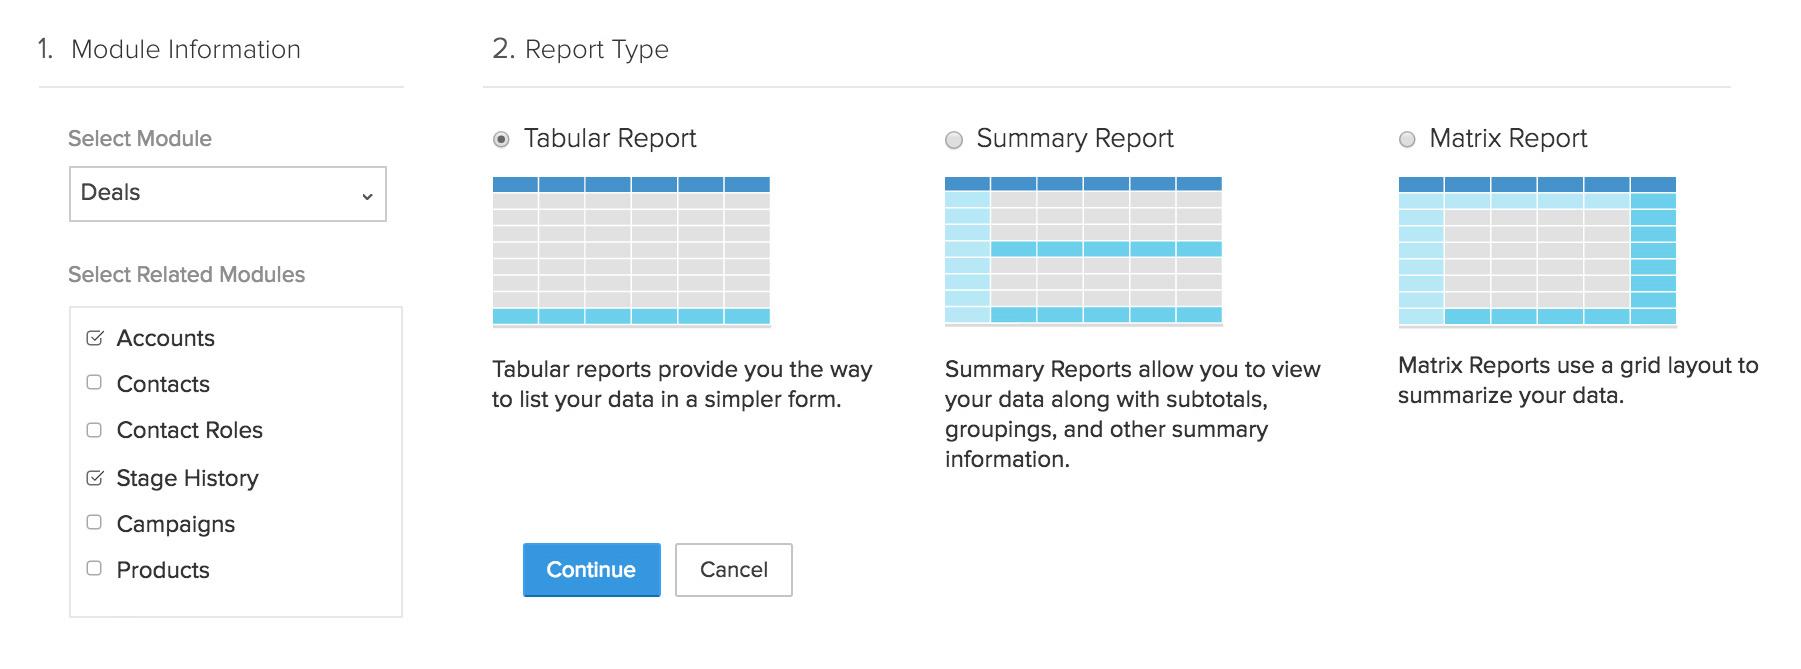 salesman daily report format